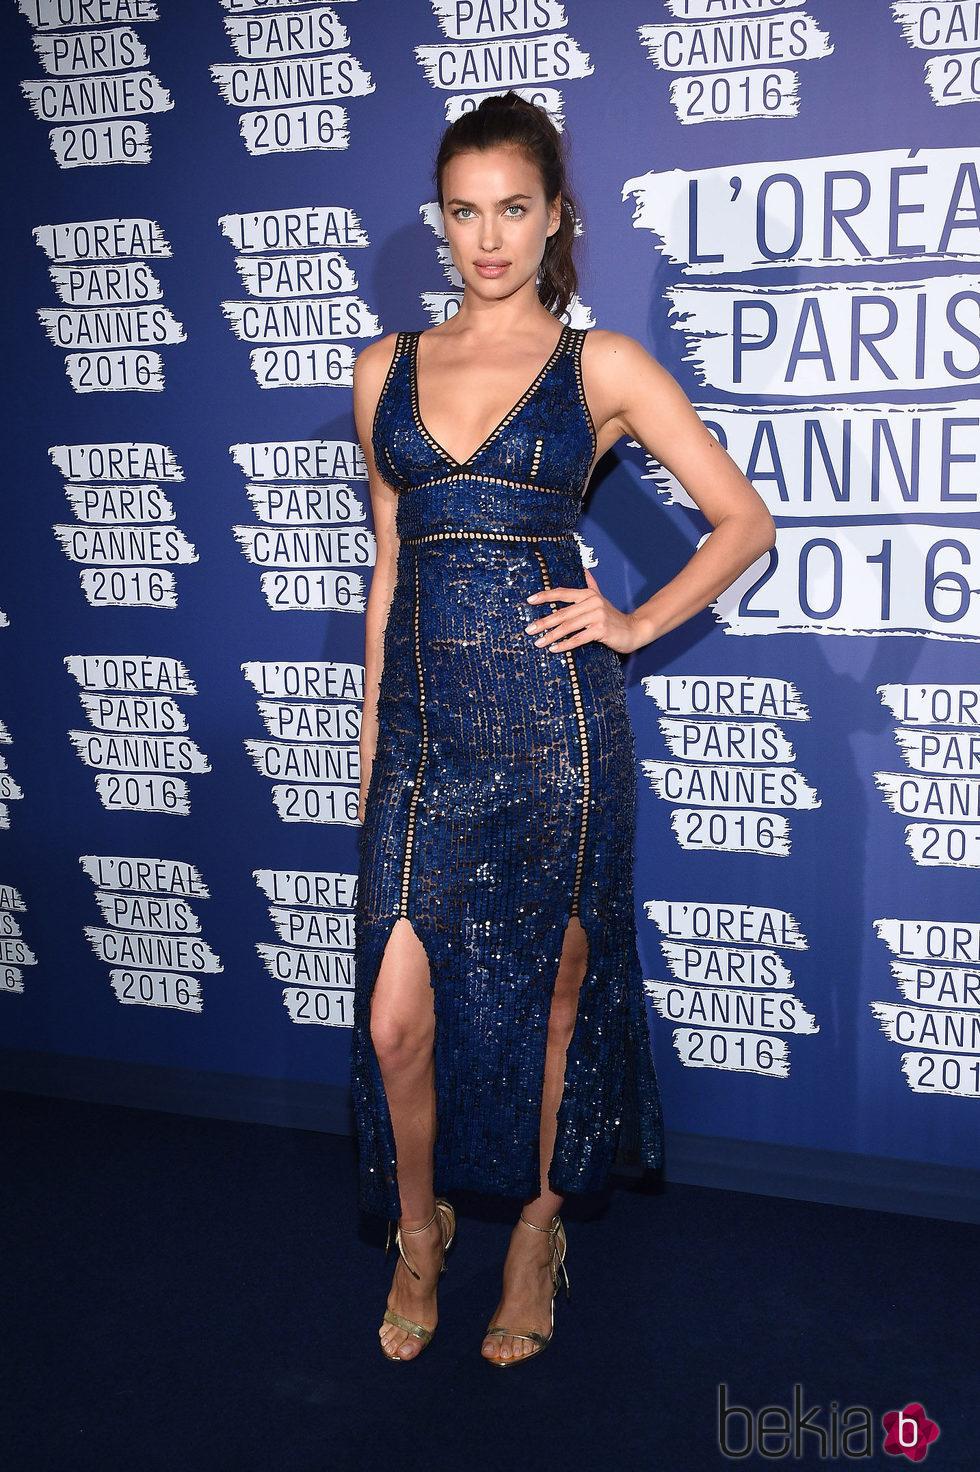 Irina Shayk en la fiesta 'Blue Obssesion' de L'oréal Paris durante el Festival de Cannes 2016